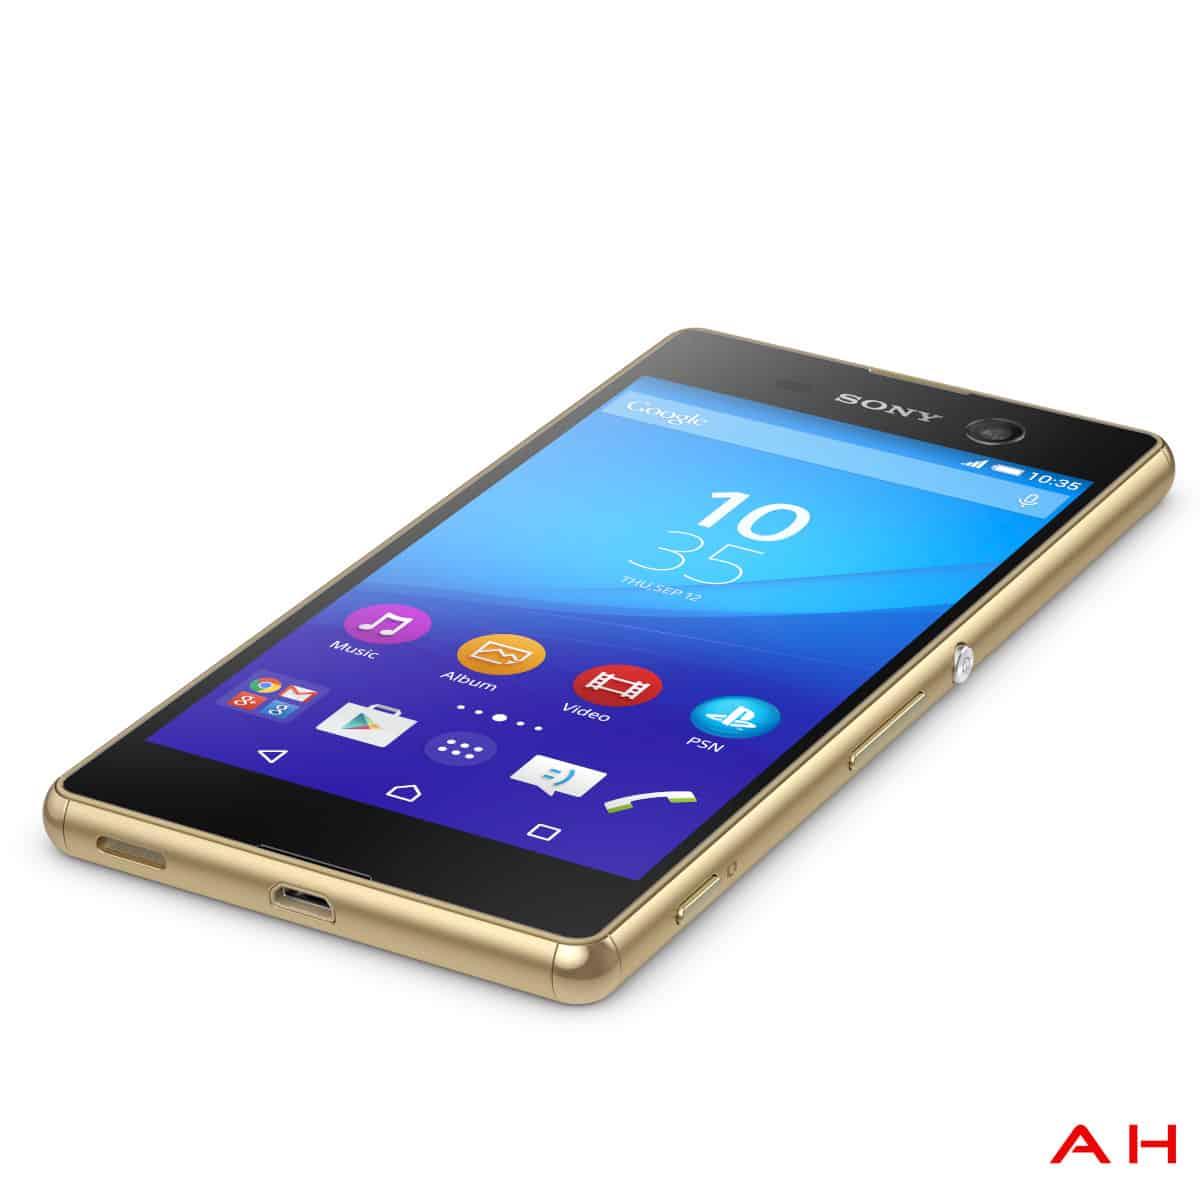 AH Sony Xperia M5 Press Images-7